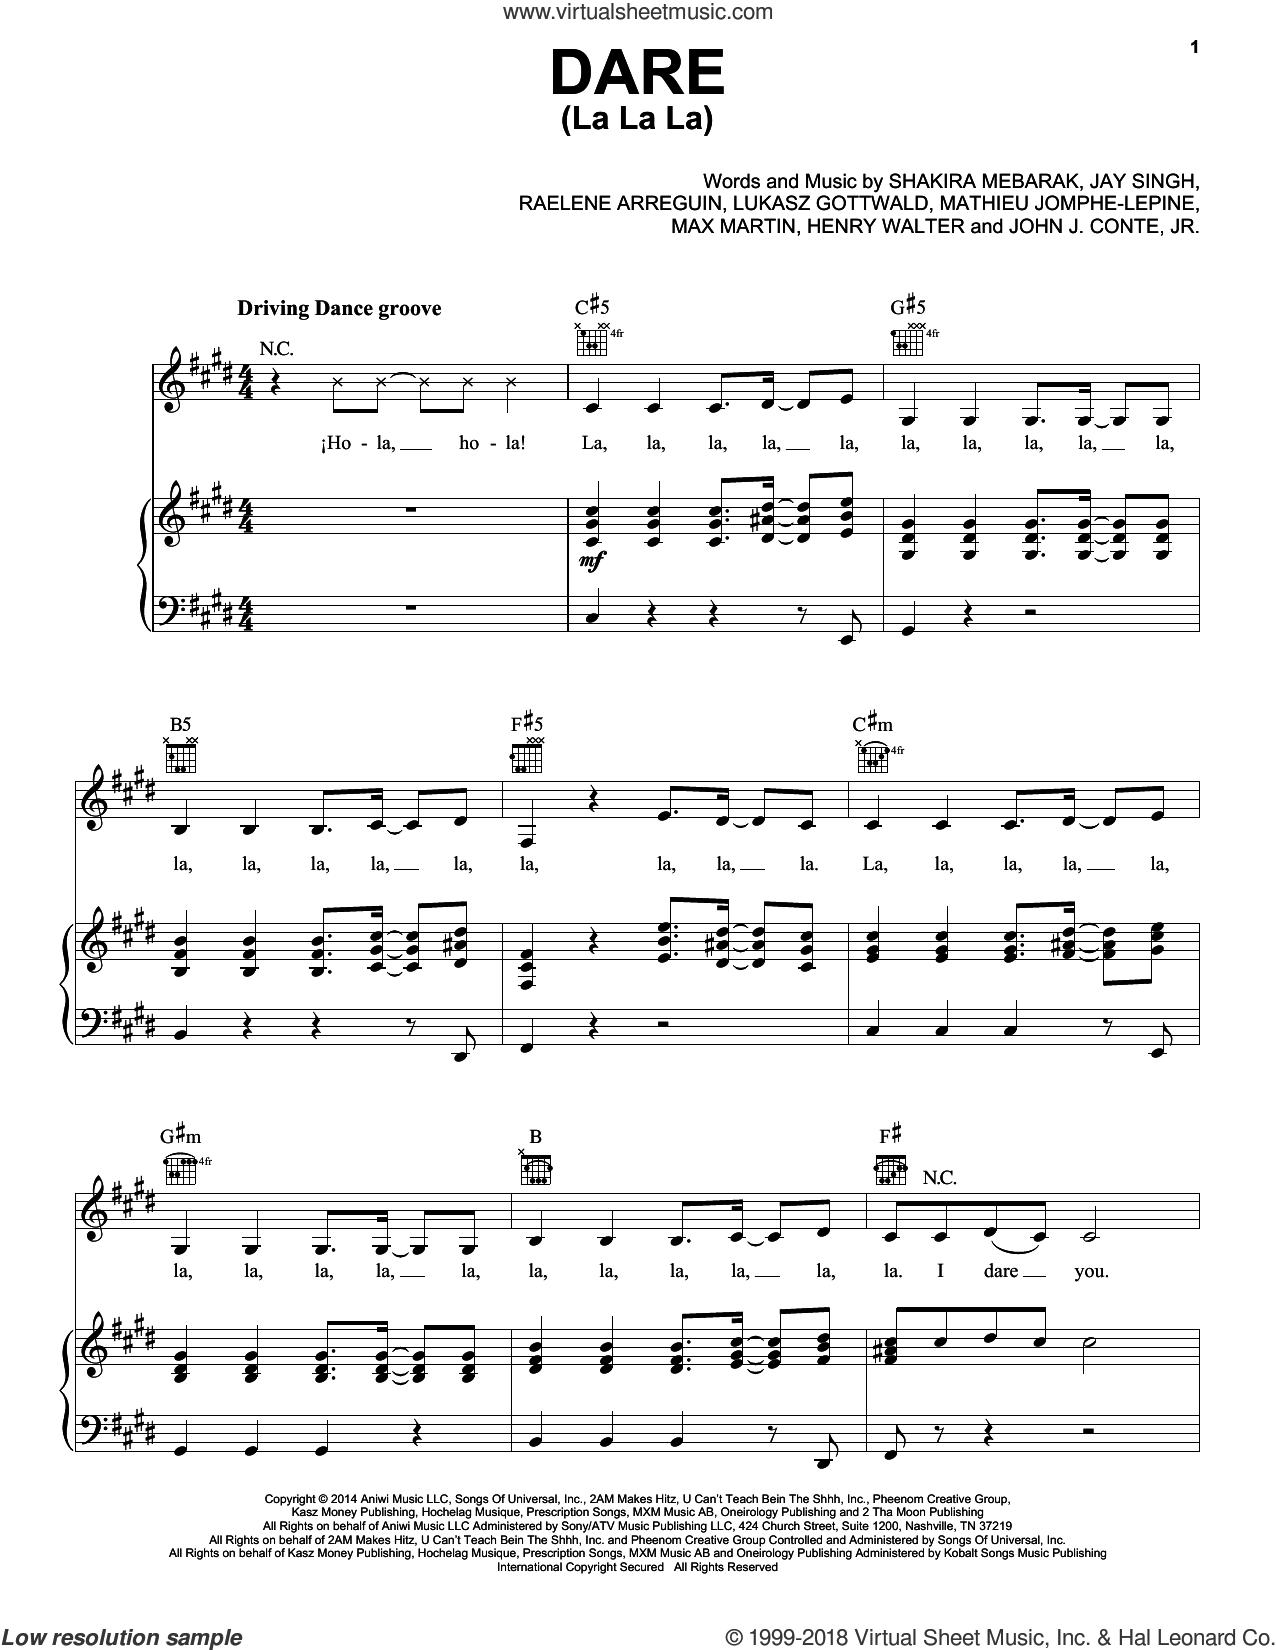 Dare (La La La) sheet music for voice, piano or guitar by Shakira, Henry Walter, Jay Singh, John J. Conte, Jr., Lukasz Gottwald, Mathieu Jomphe-Lepine, Max Martin, Raelene Arreguin and Shakira Mebarak, intermediate skill level